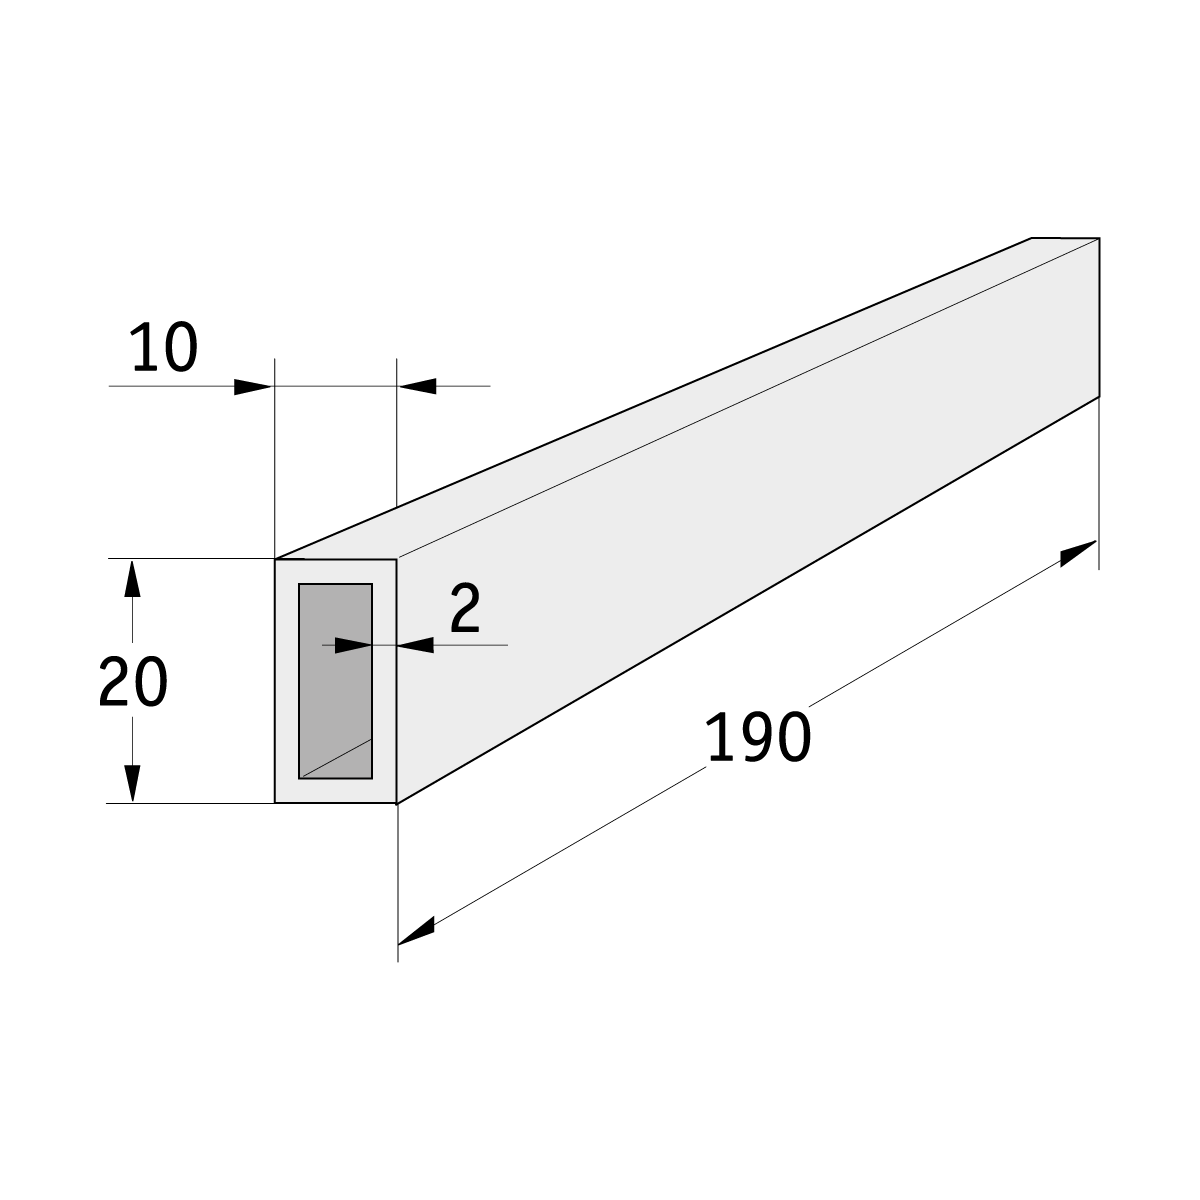 23 016 000 Verbindungselement milano - https://www.werzalit.com/en/product/verbindungselement-milano/